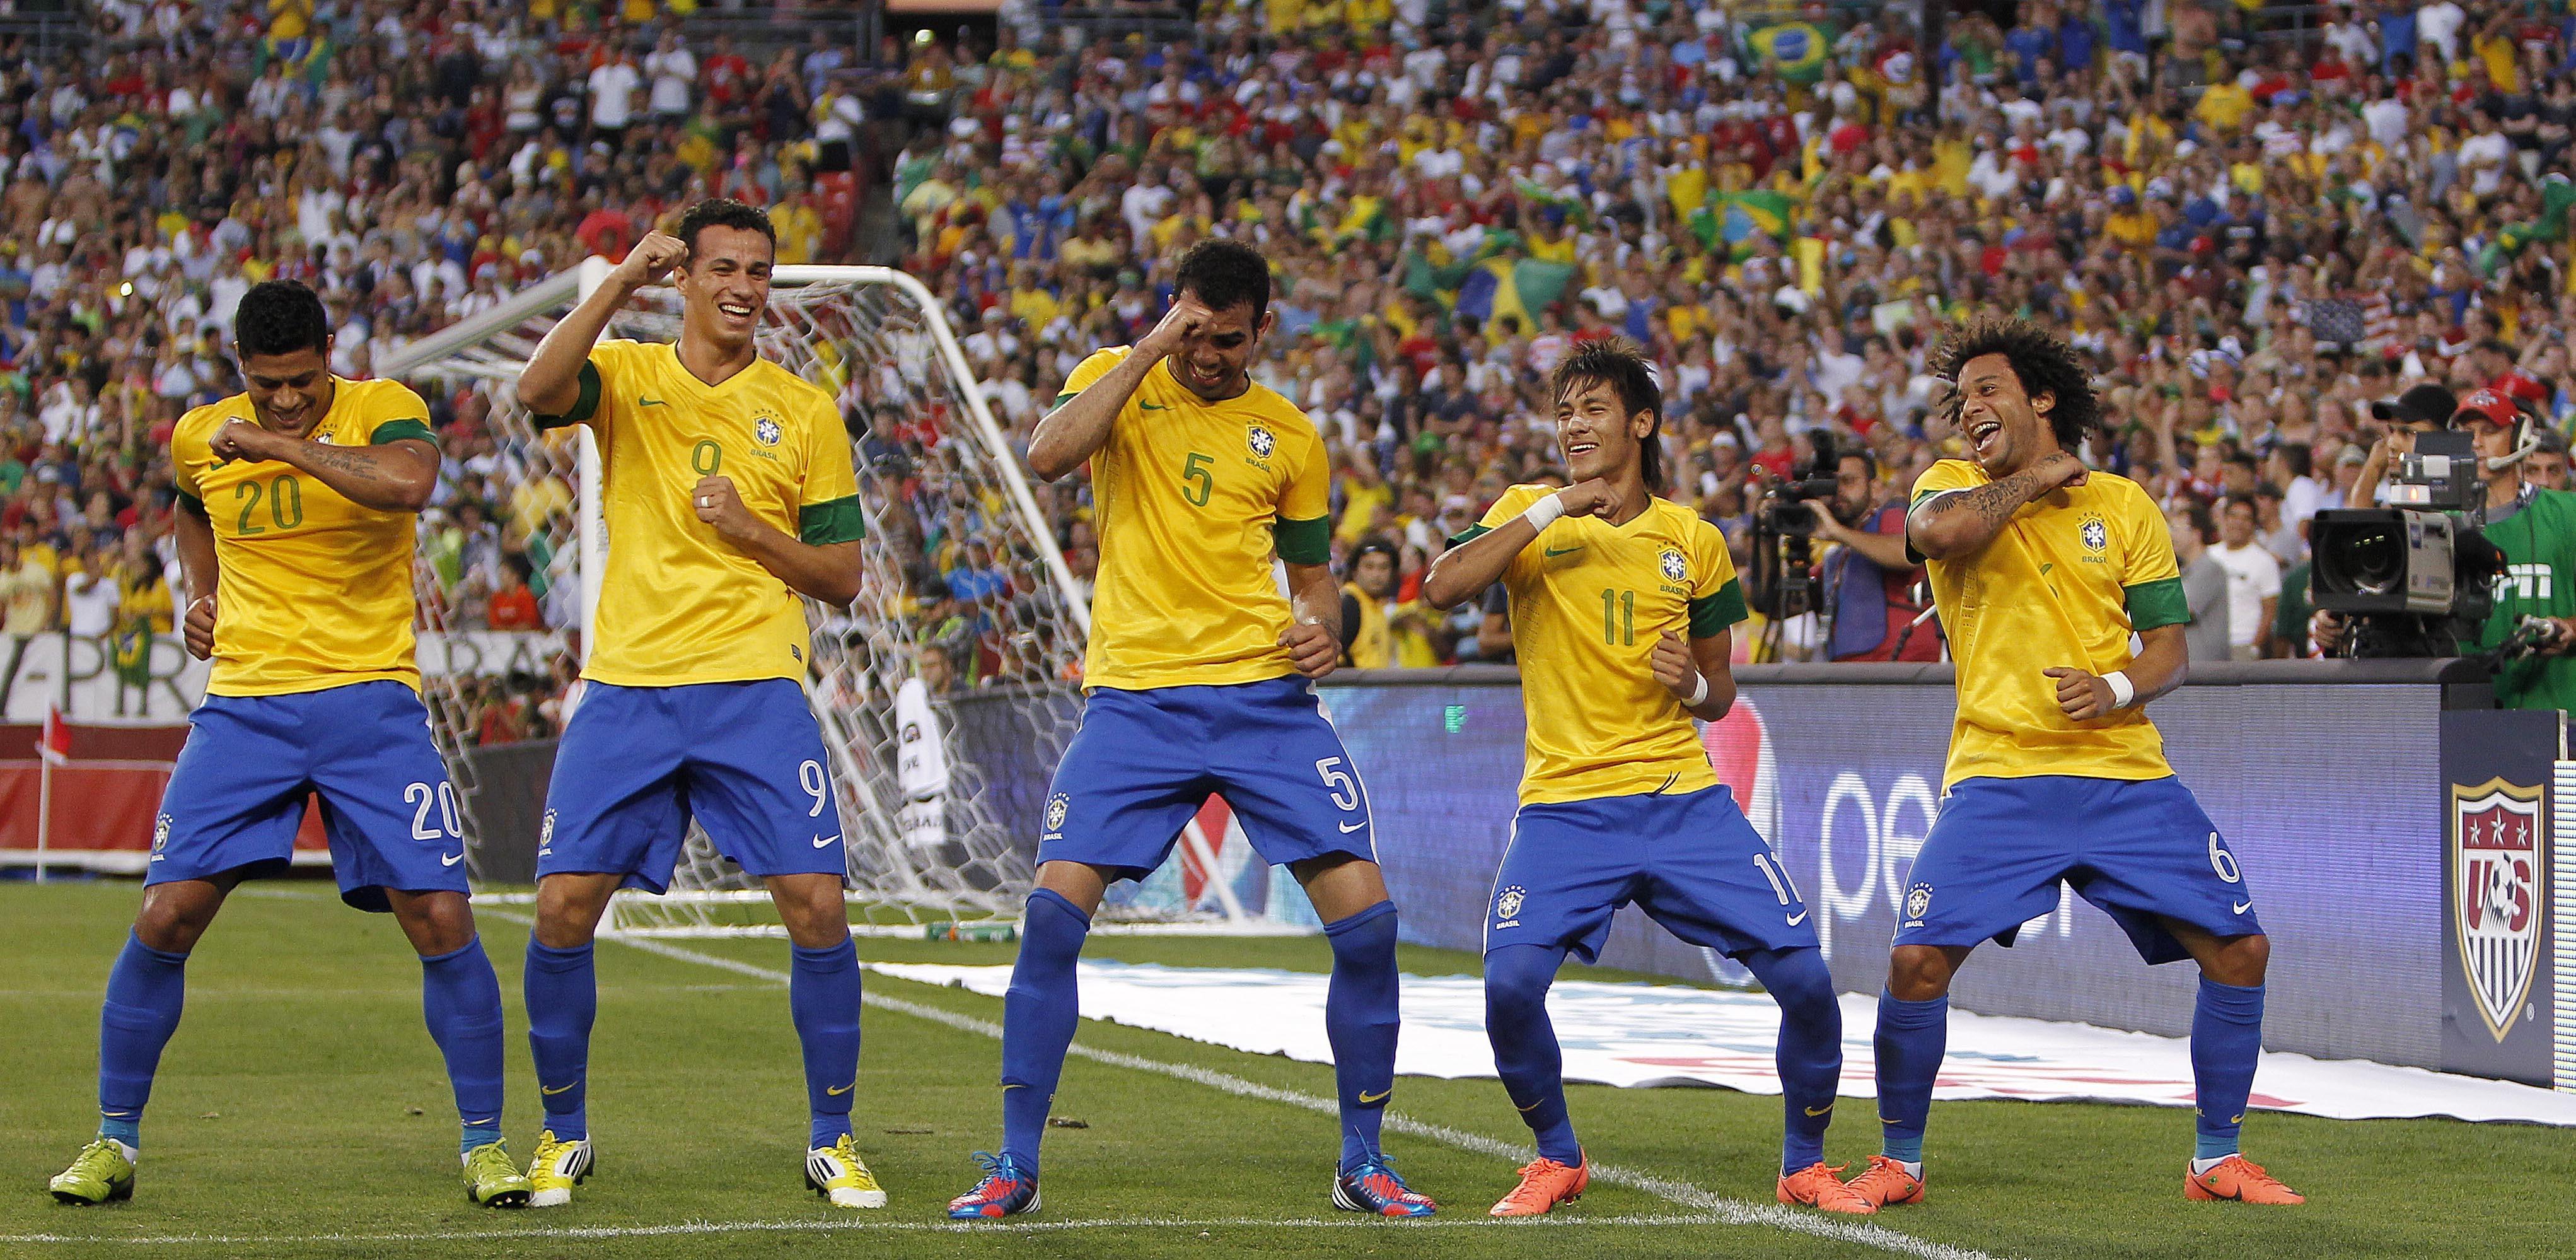 Топ-10 дорогих бразильцев